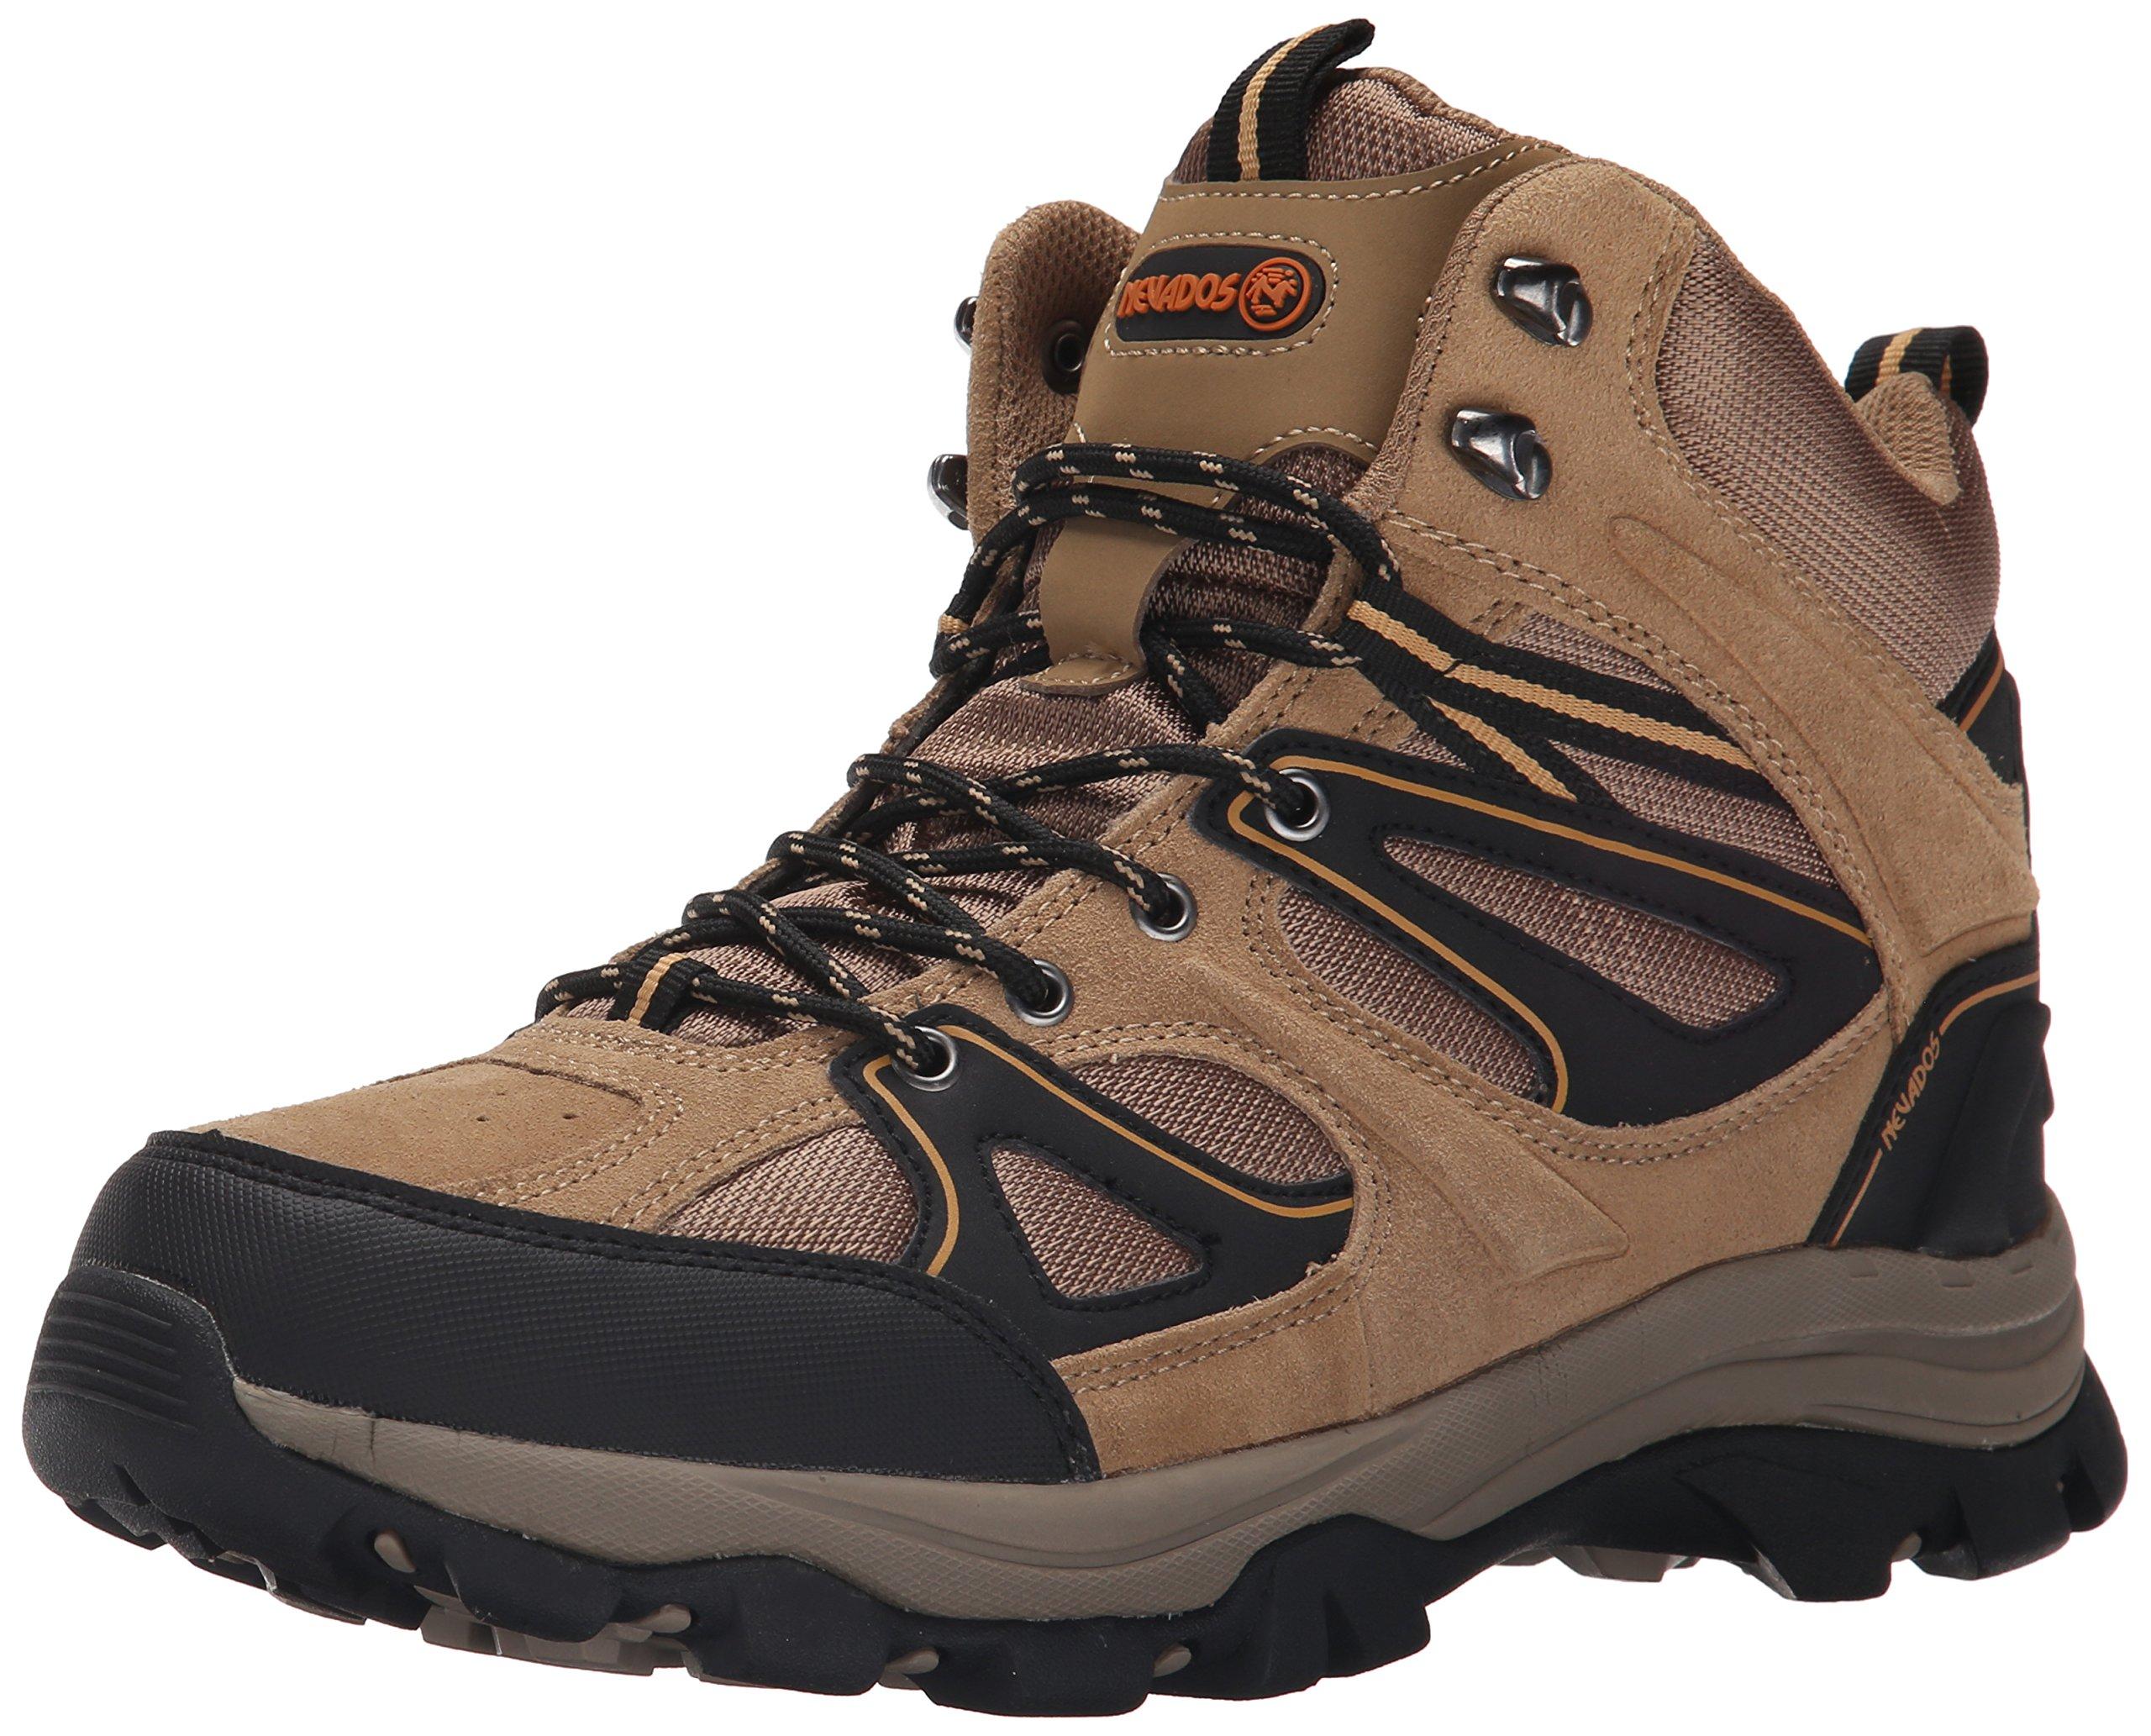 Nevados Men's Talus Hiking Boot, Light Brown/Light Brown/Black, 13 M US